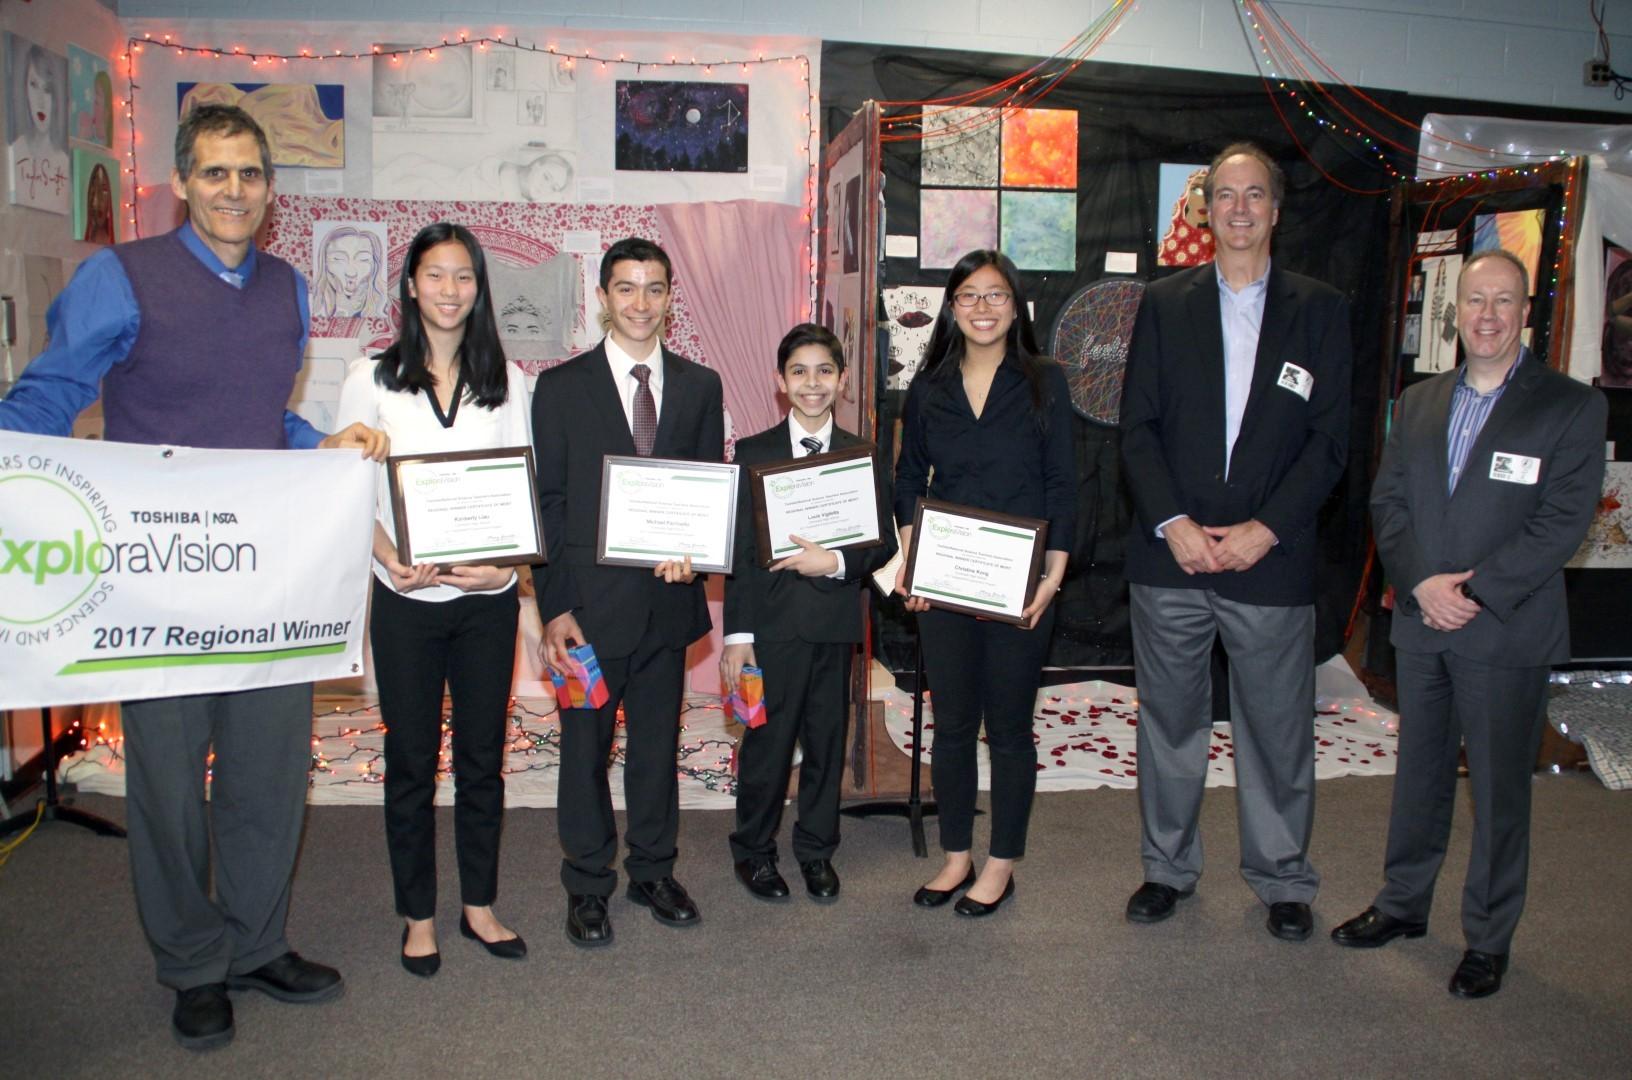 Regional Winners with Toshiba Representatives